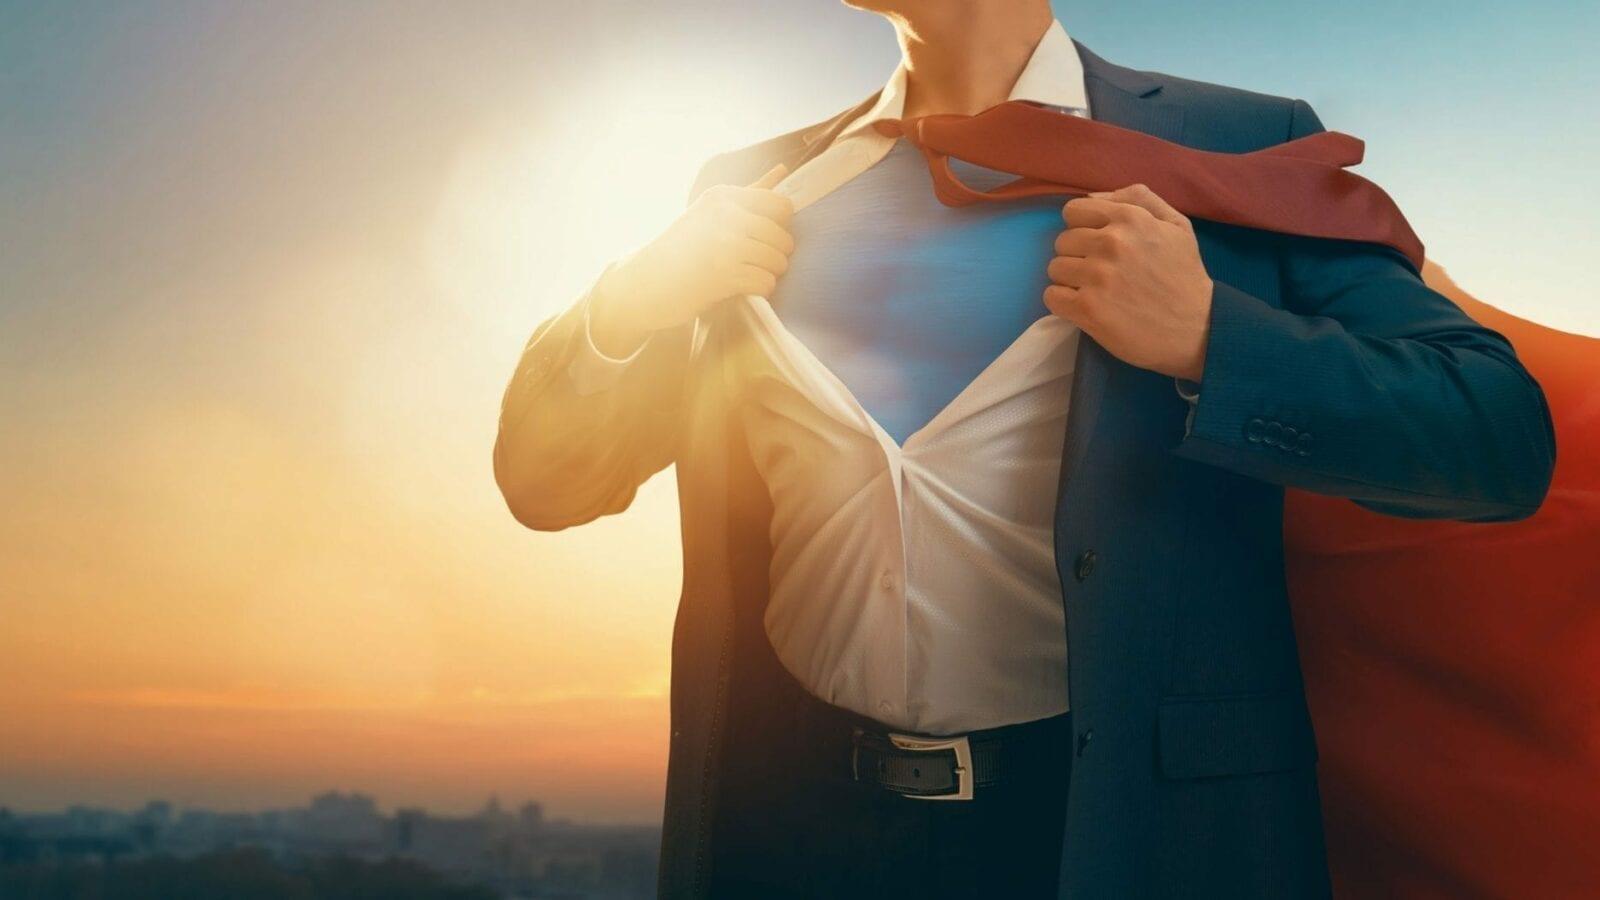 Is your website button Superman or Clark Kent?